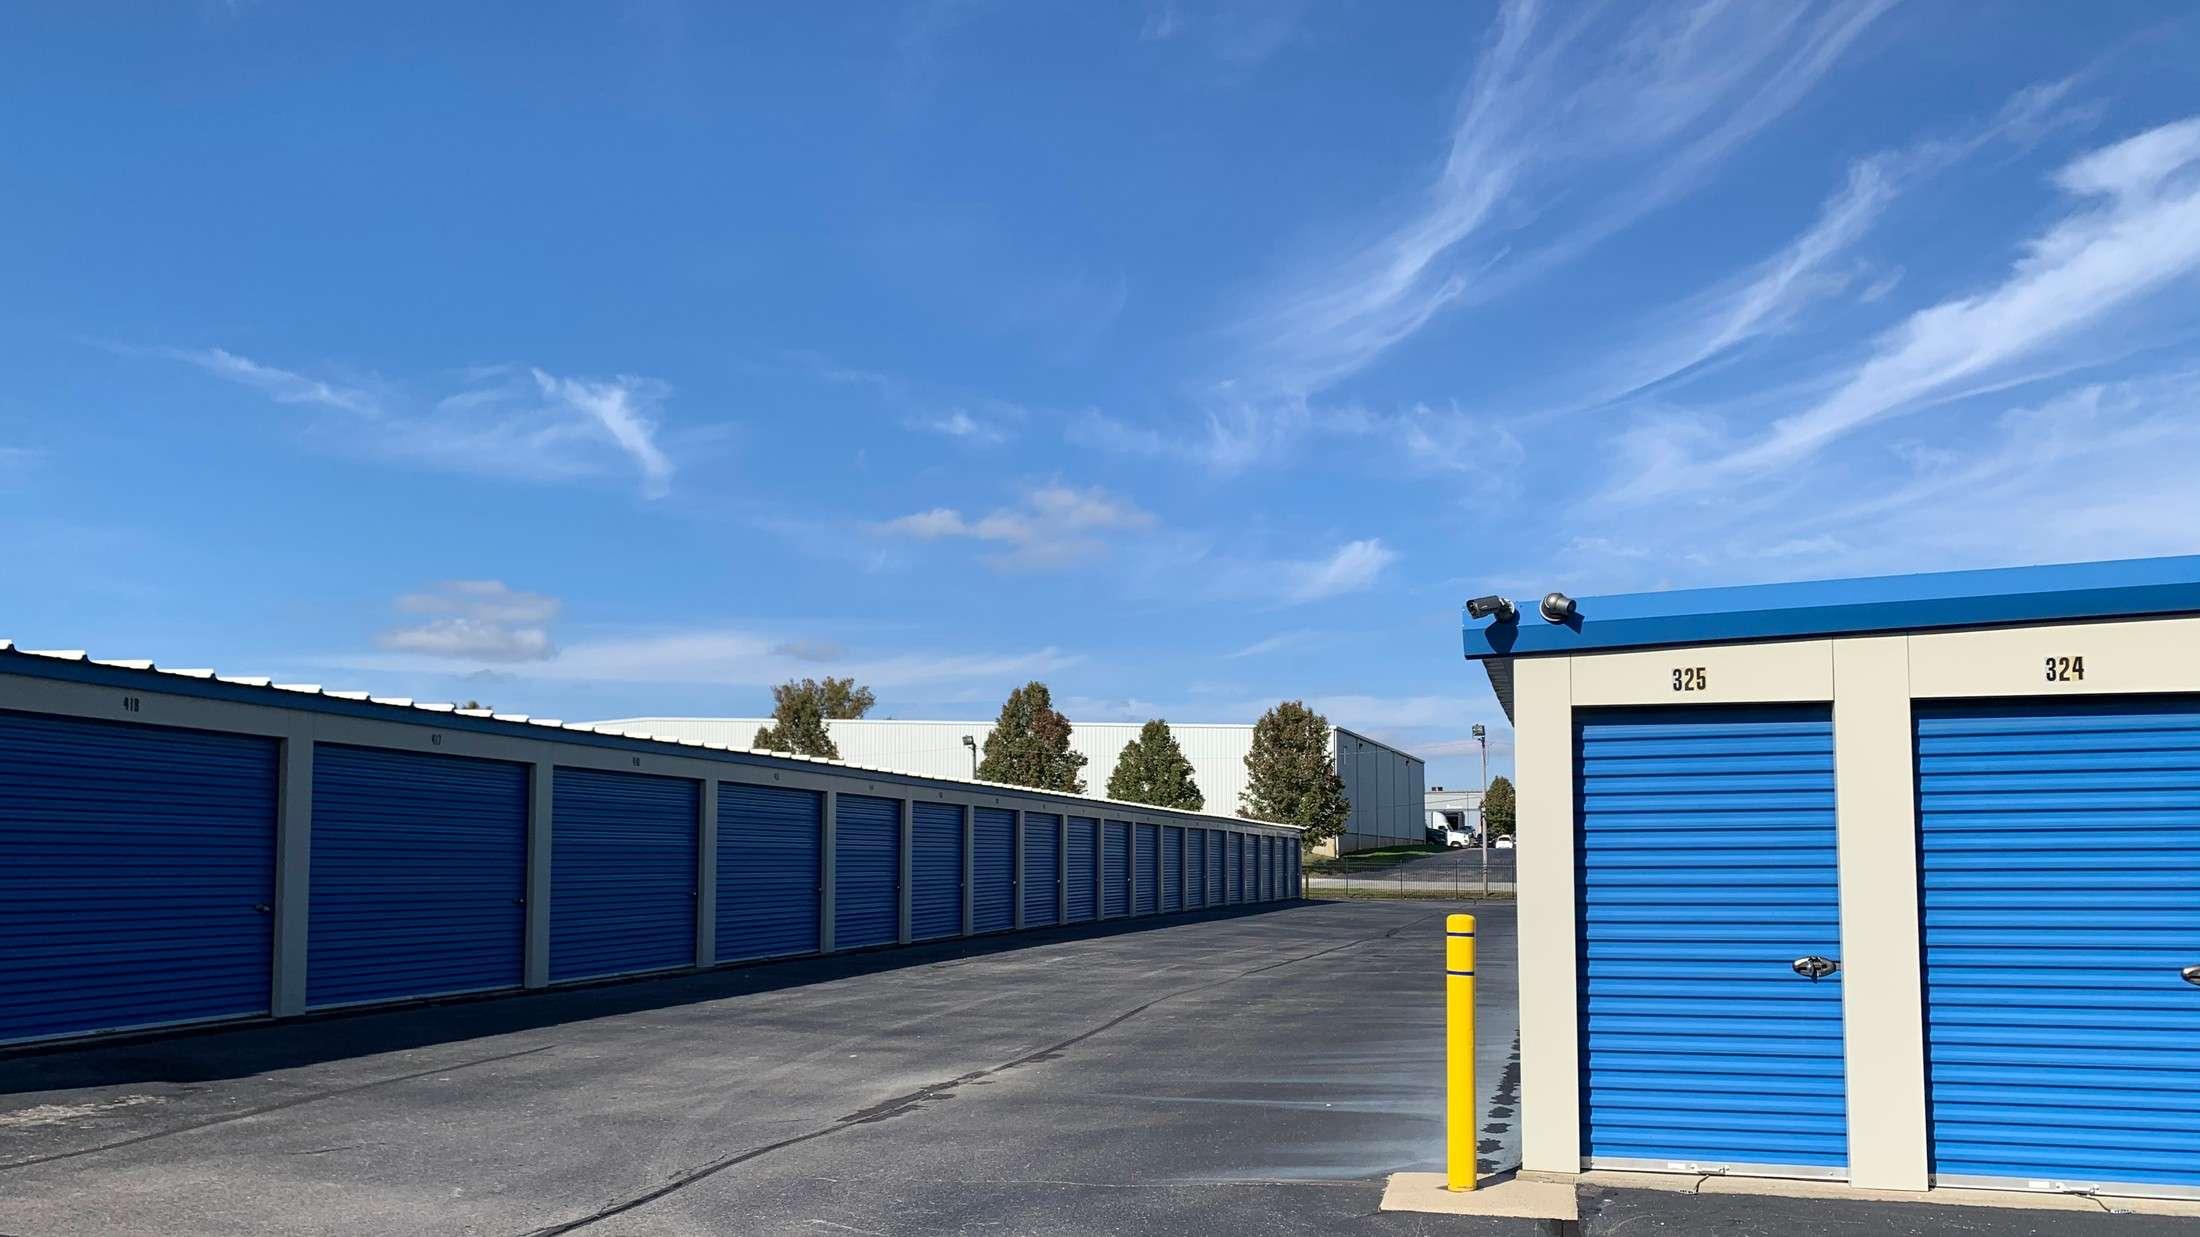 Storage Units and Aisle